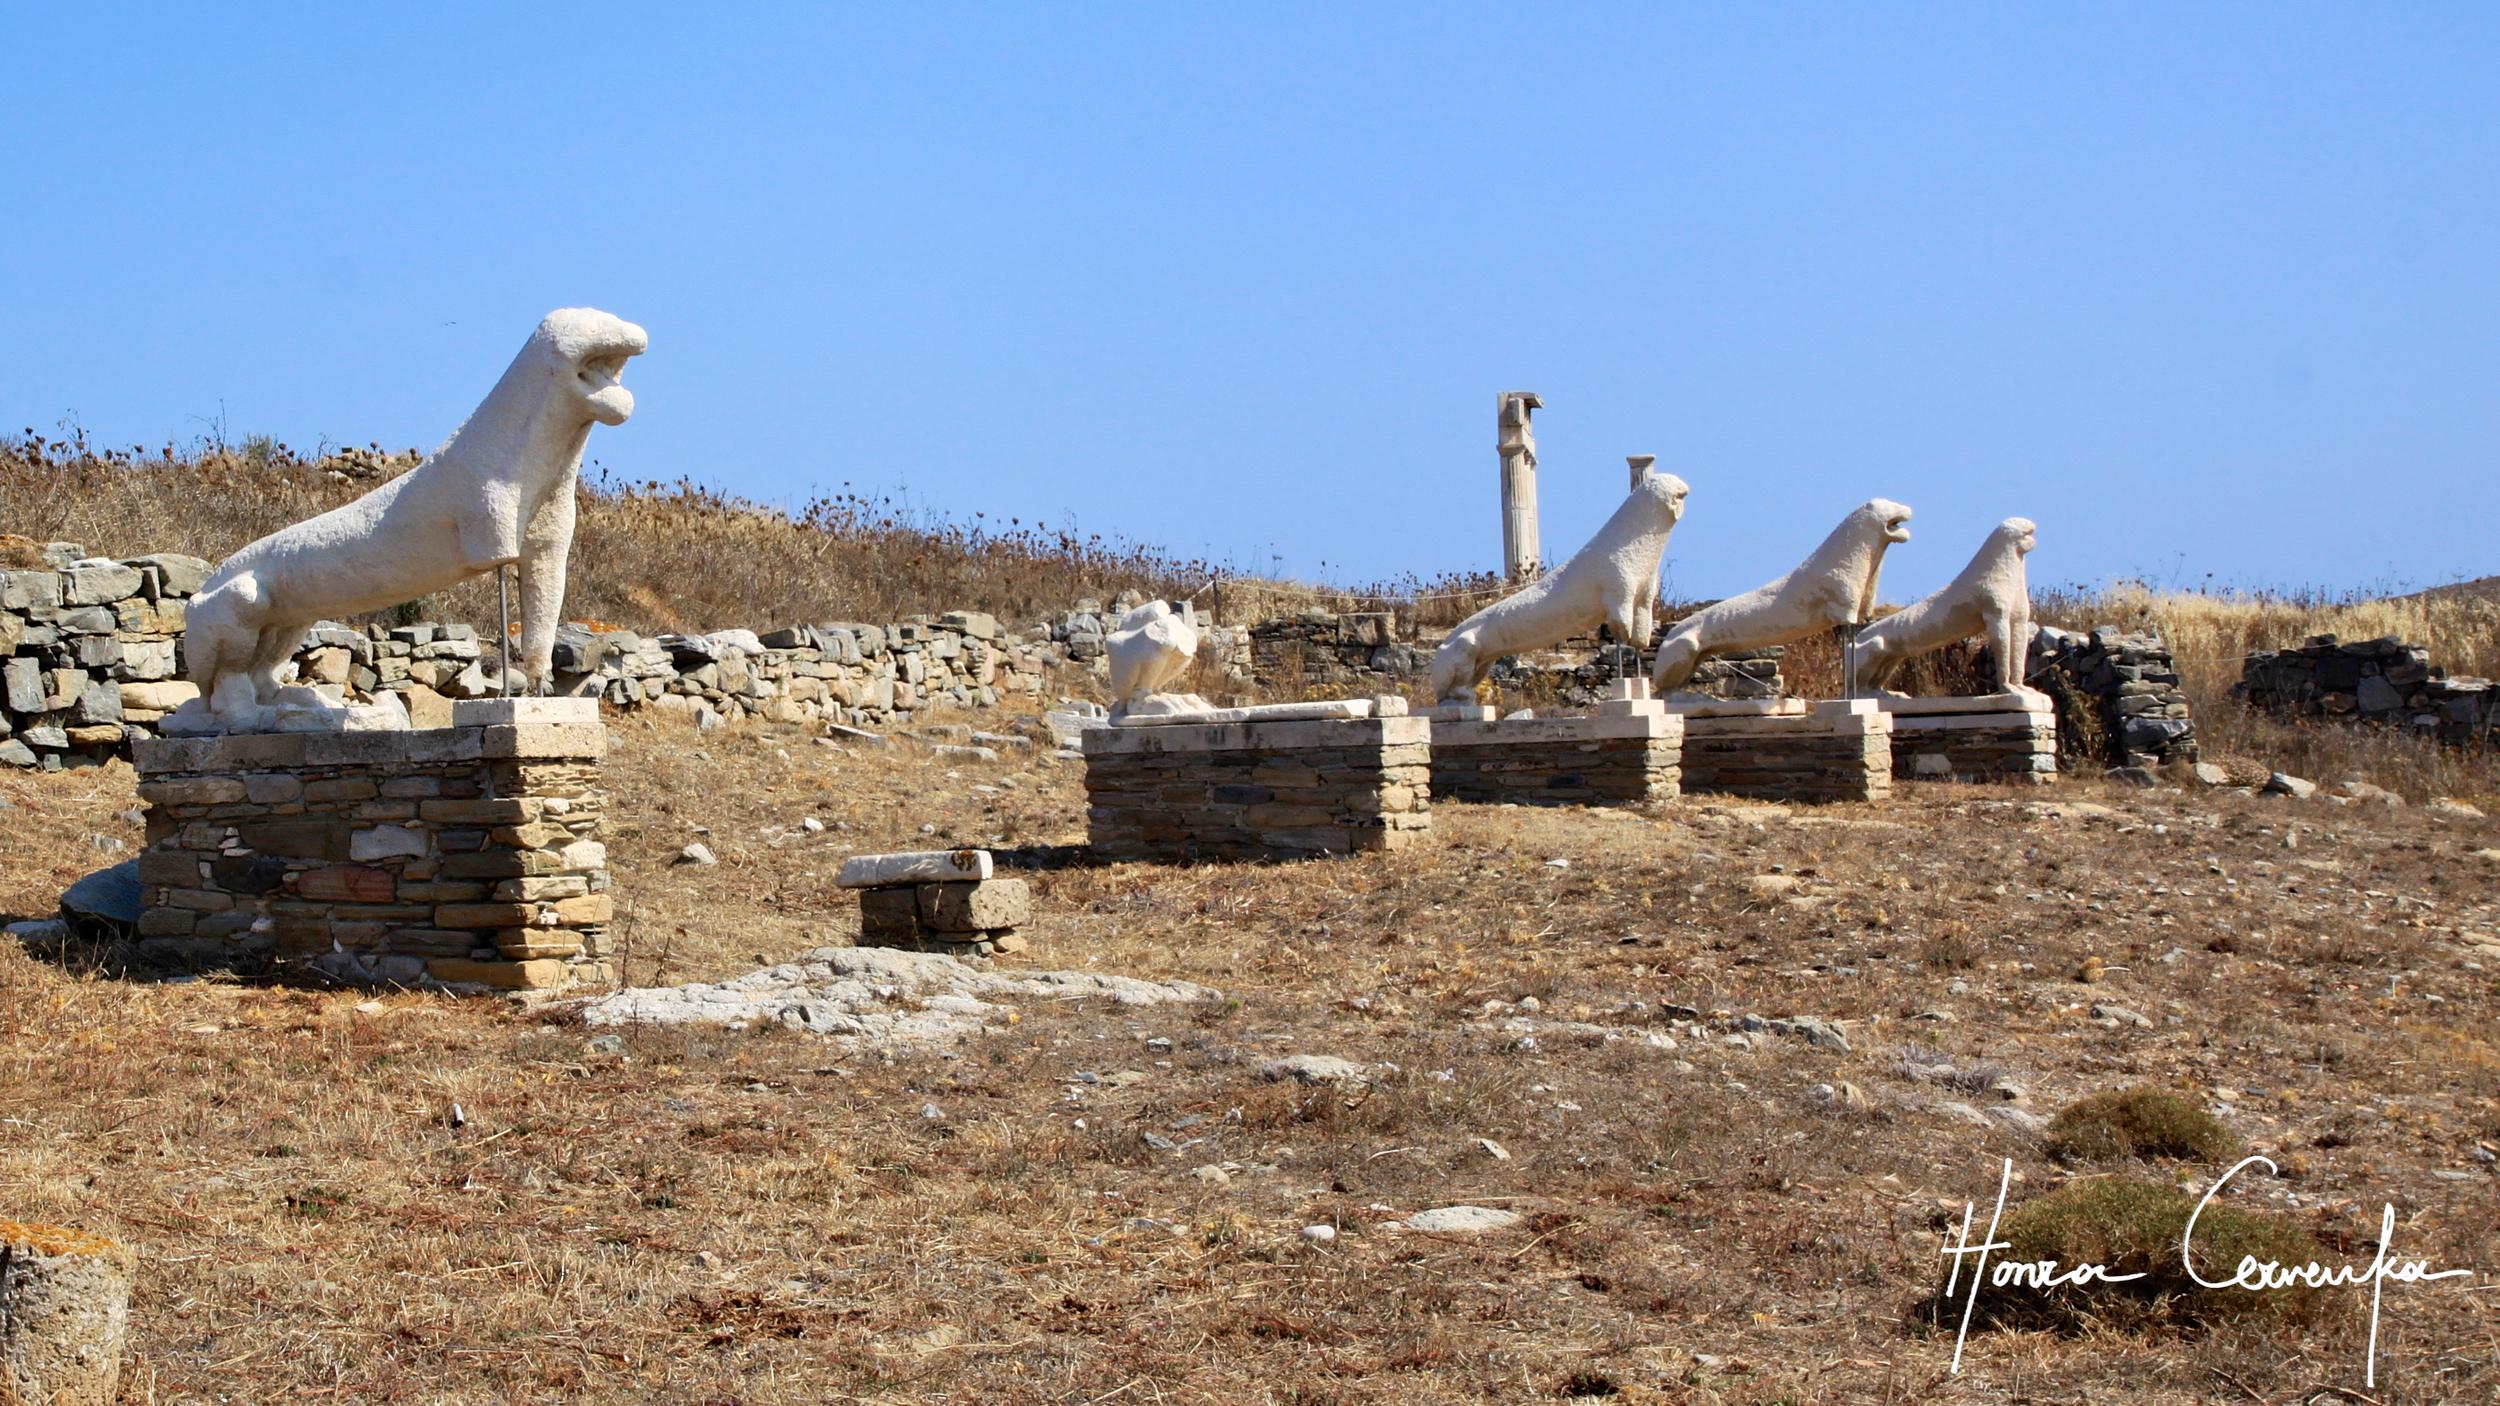 Delos-Greece-2013-Honza-Cervenka.jpg